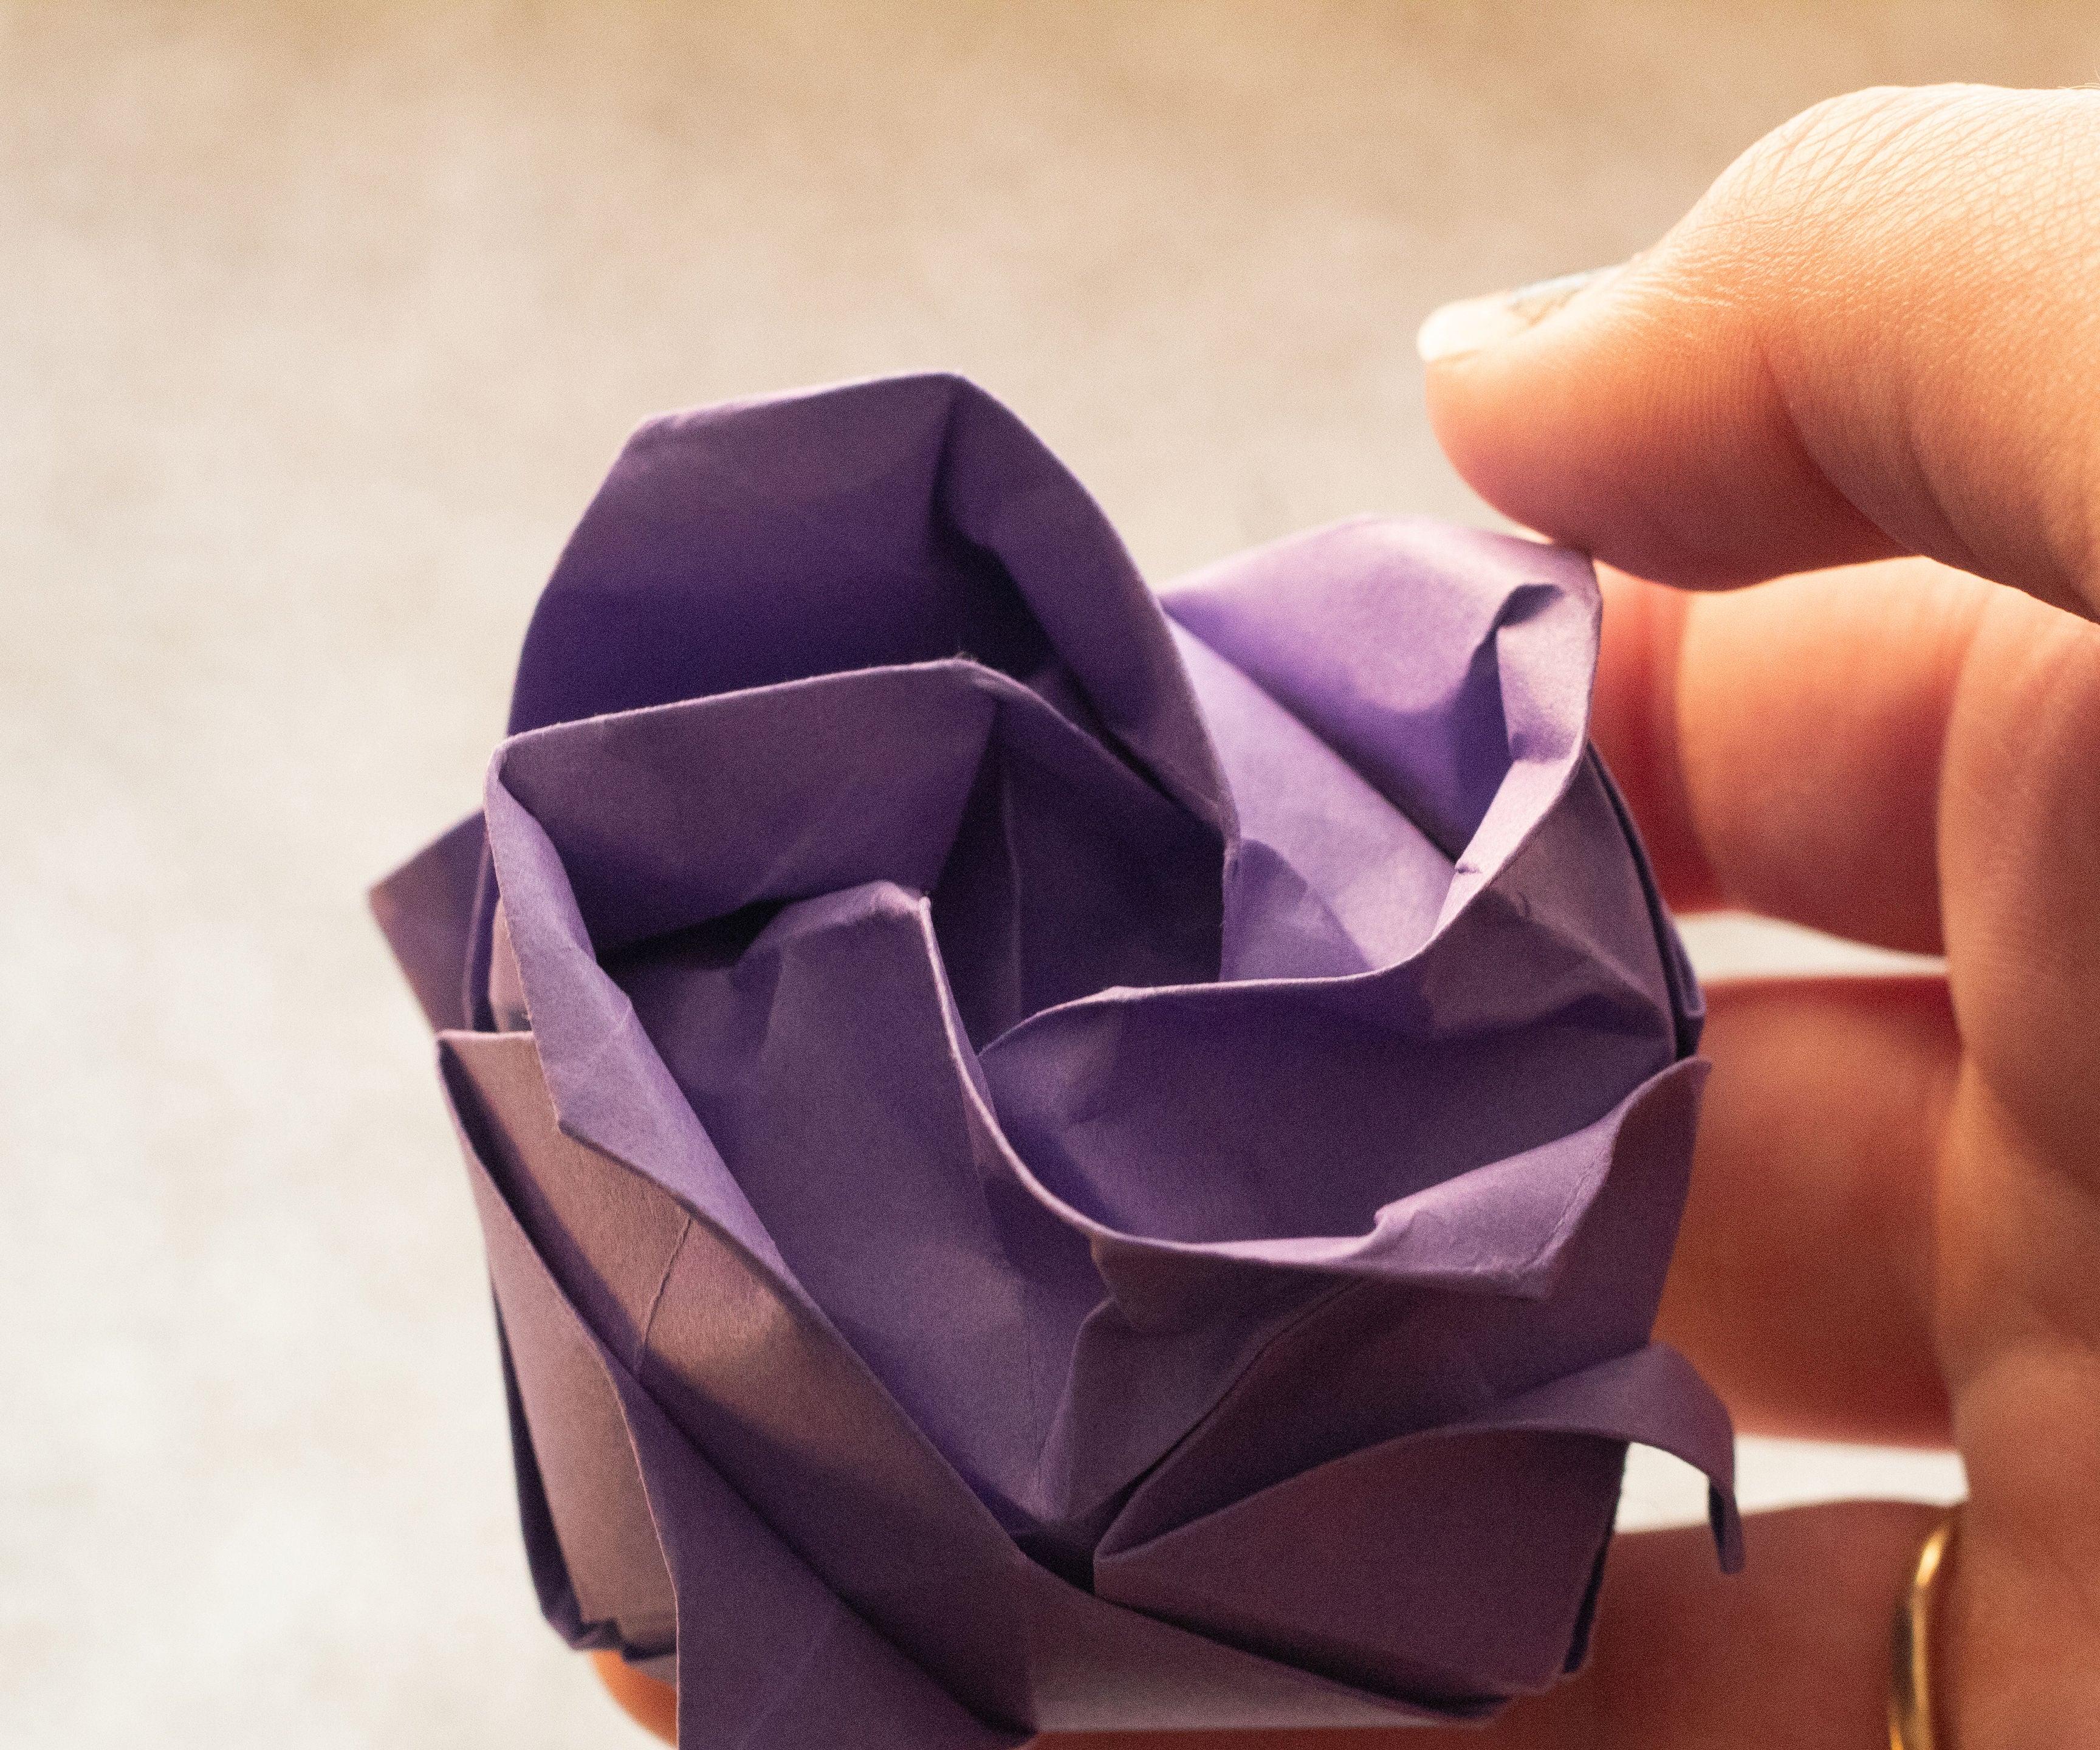 Full Bloom Origami Kawasaki Rose | Origami and math, Origami ... | 2880x3456